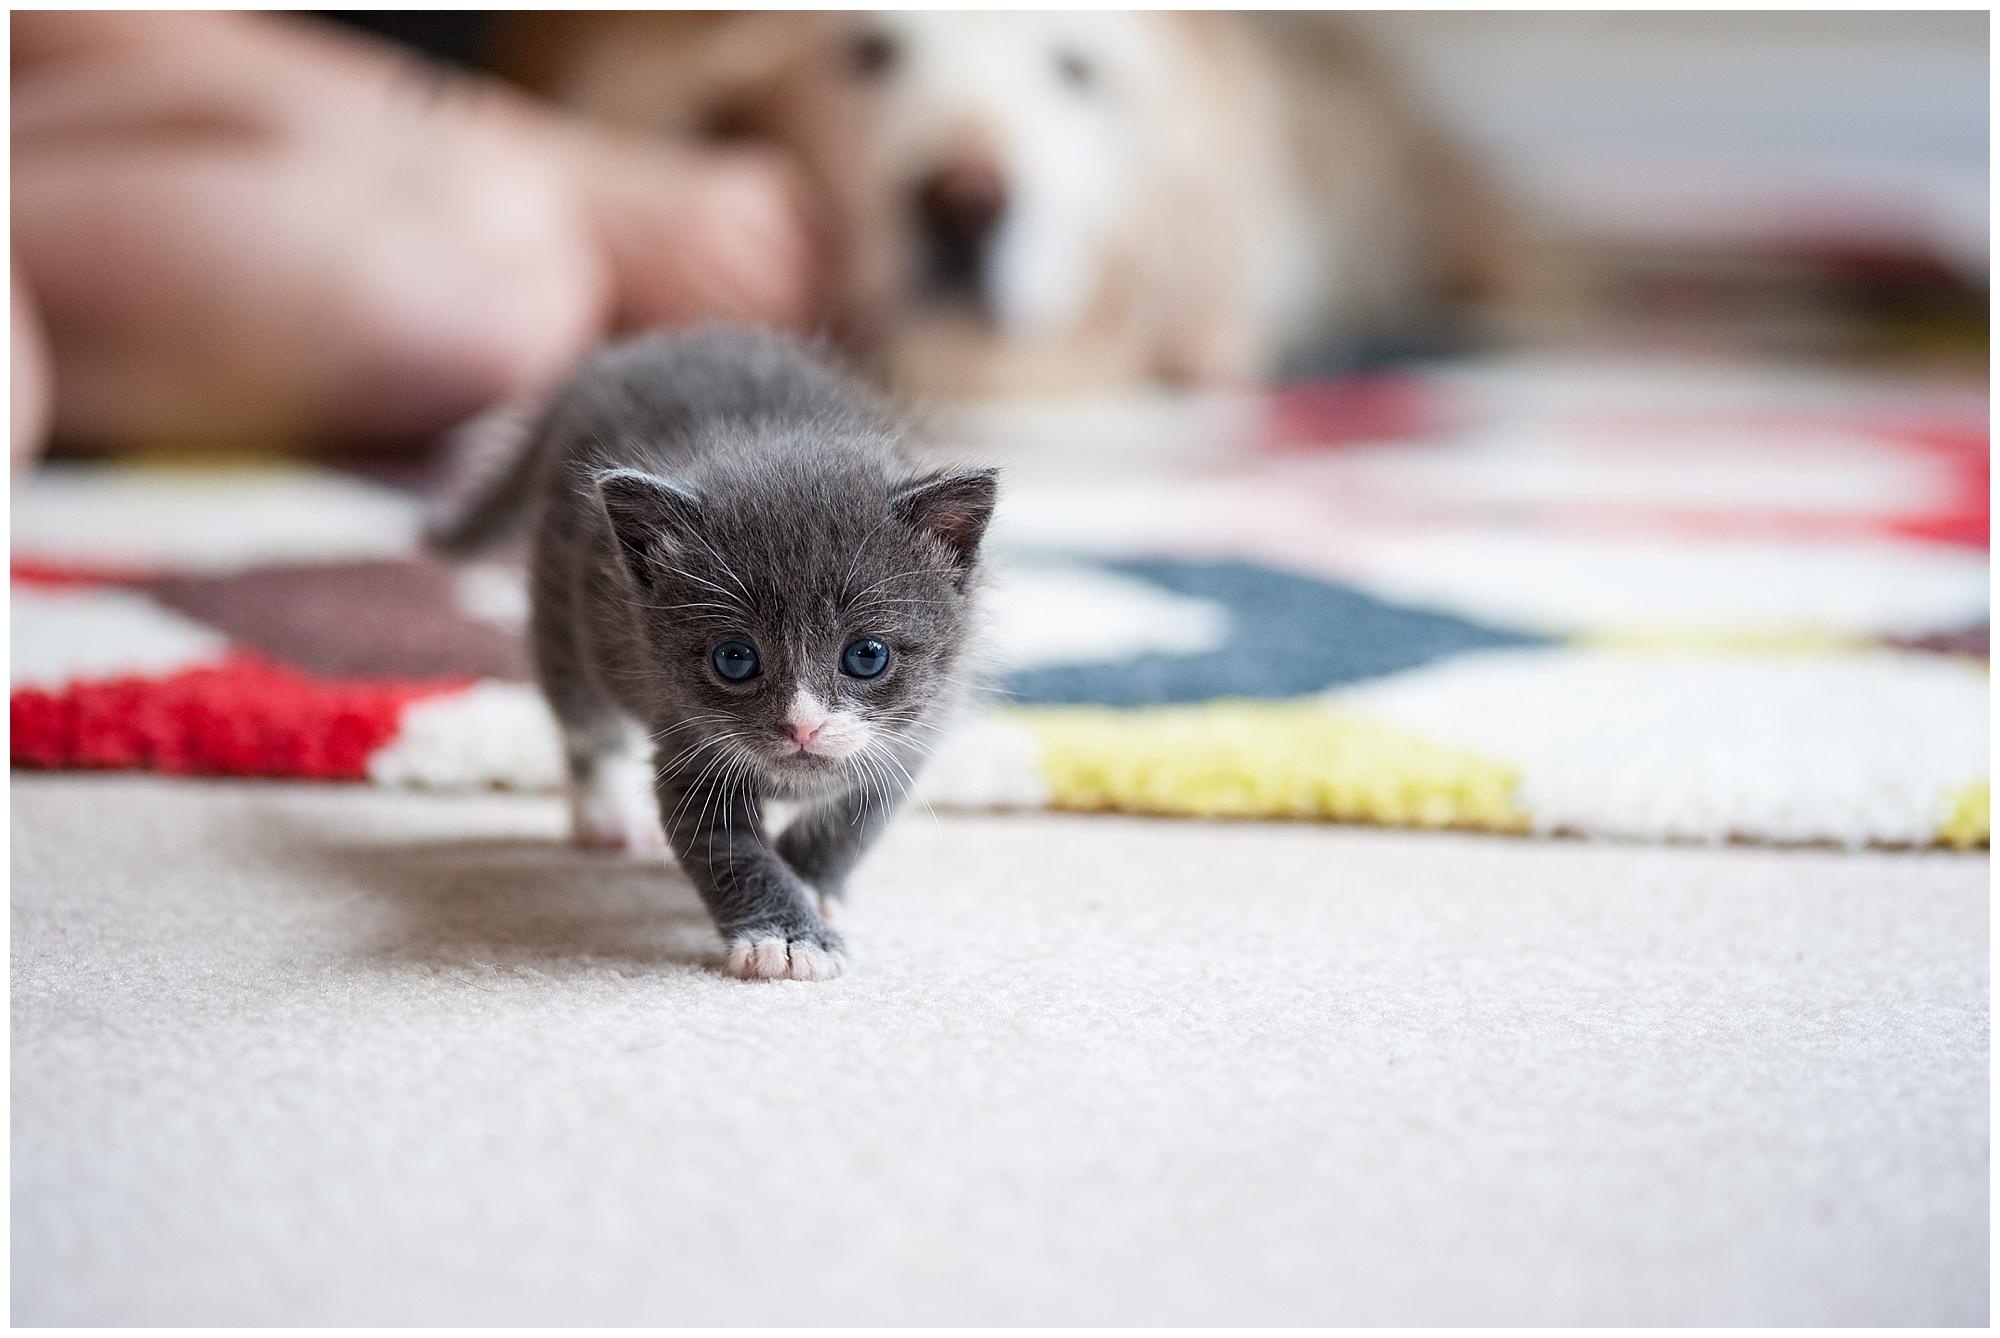 The Adventure of Raising Baby Kittens Part 3